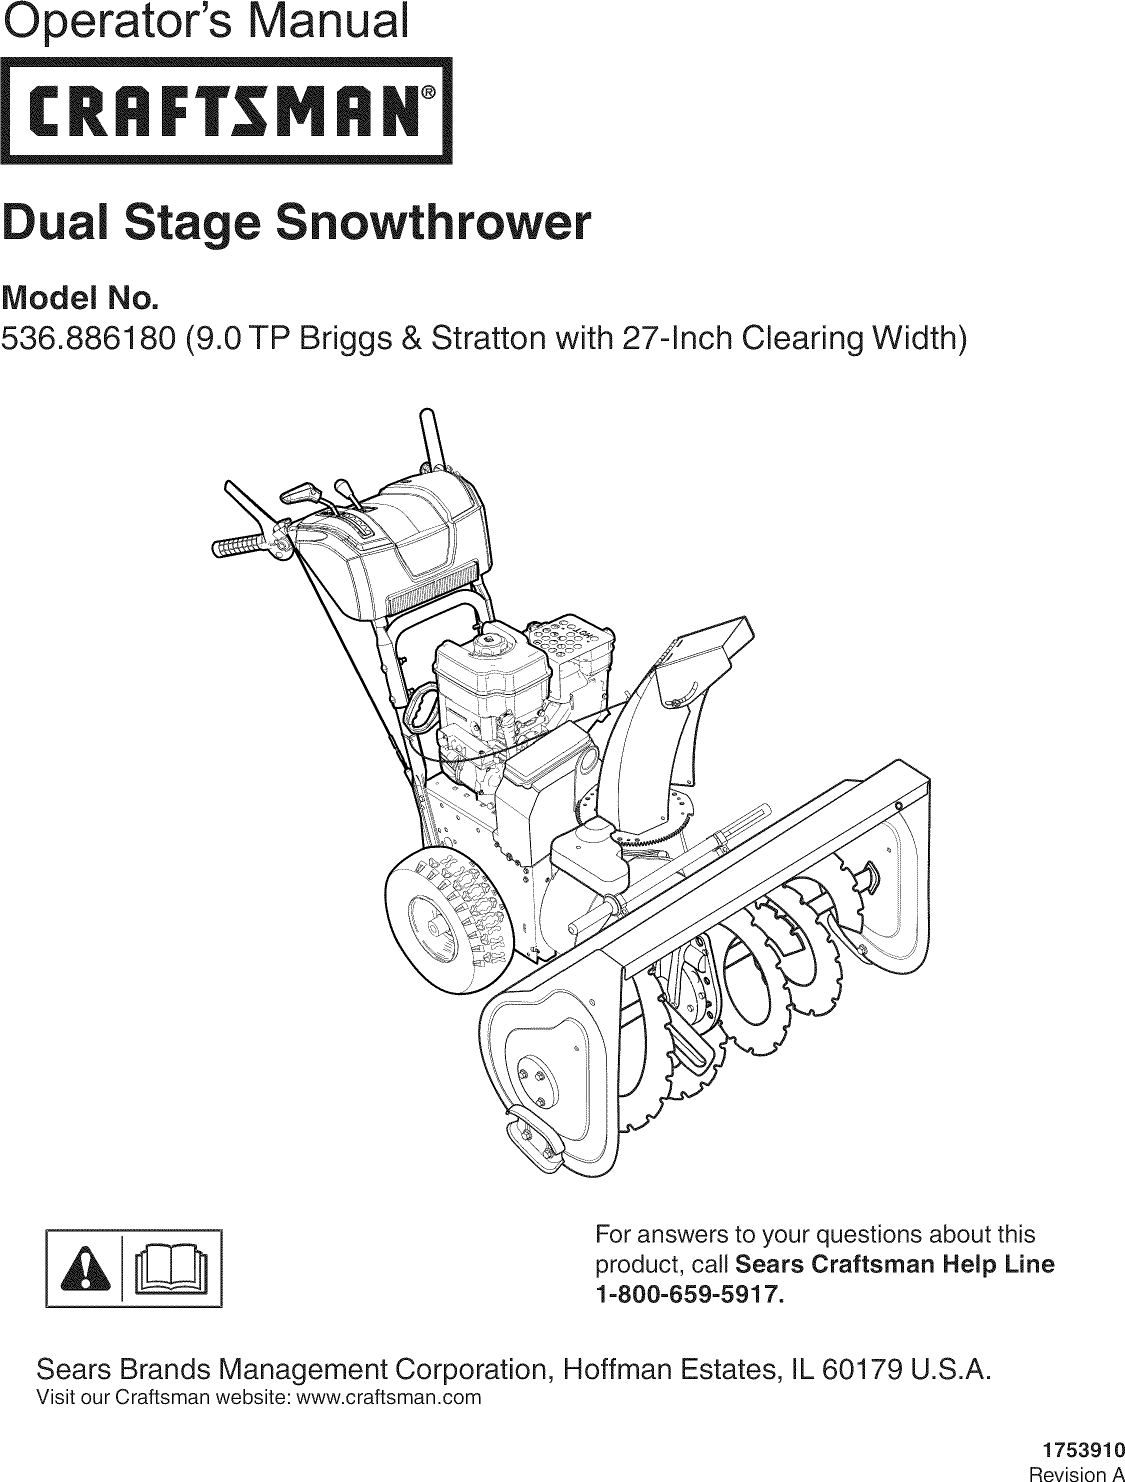 Craftsman 536886180 User Manual 1990s 8HP GAS SNOWTHROWER